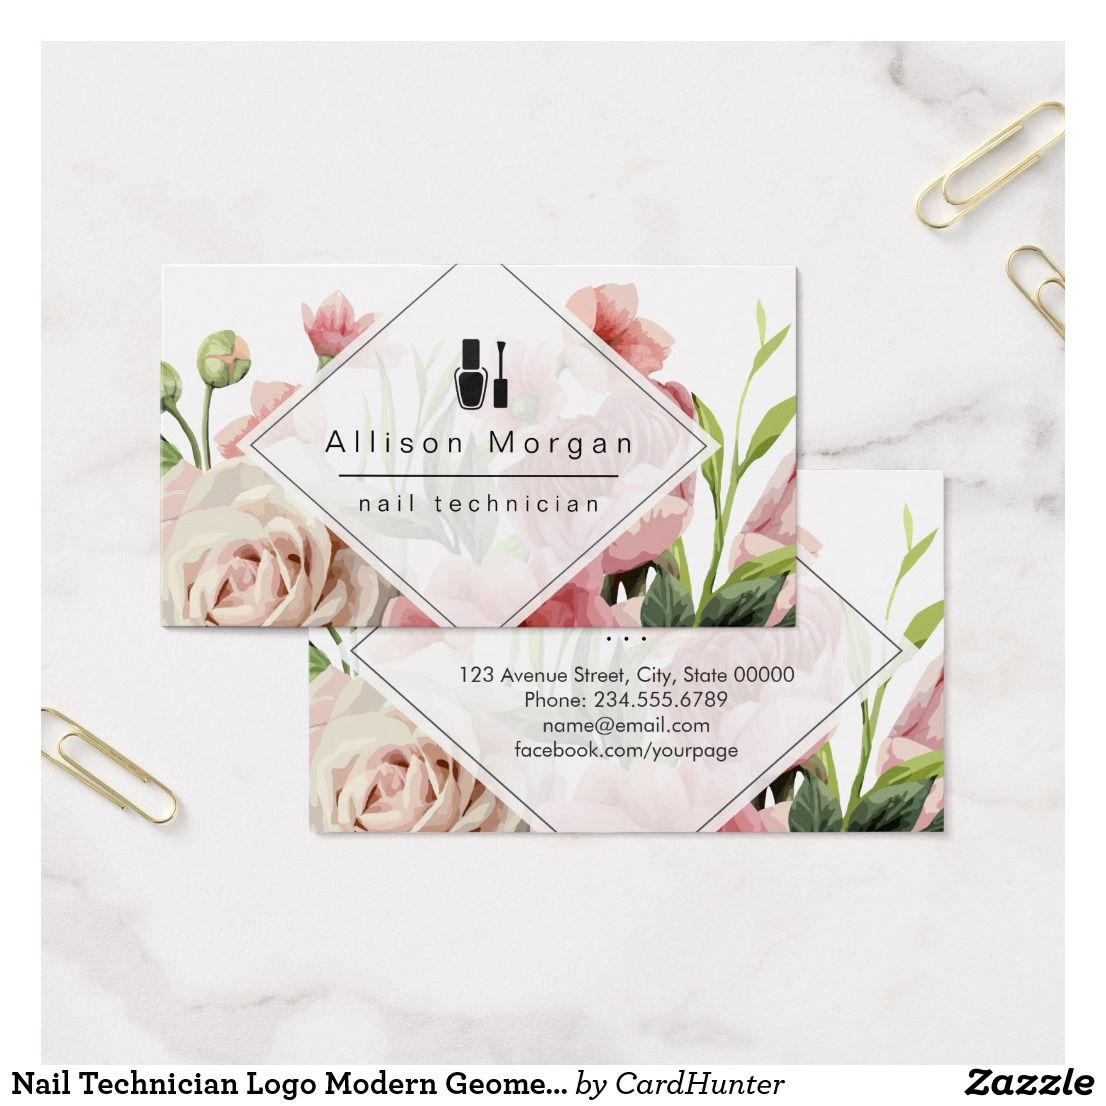 Nail Technician Logo Modern Geometric Chic Floral Business